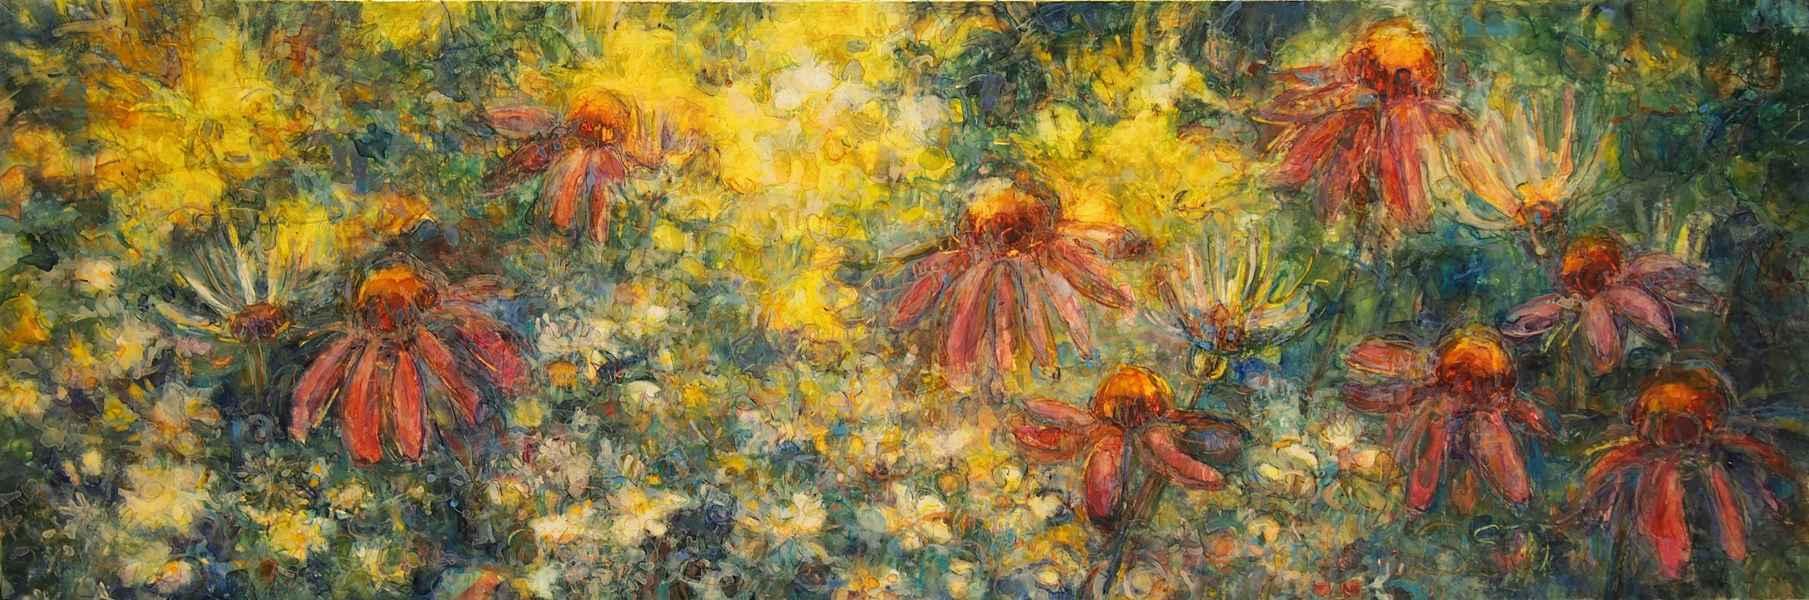 Garden Party by  Susan Wahlrab - Masterpiece Online